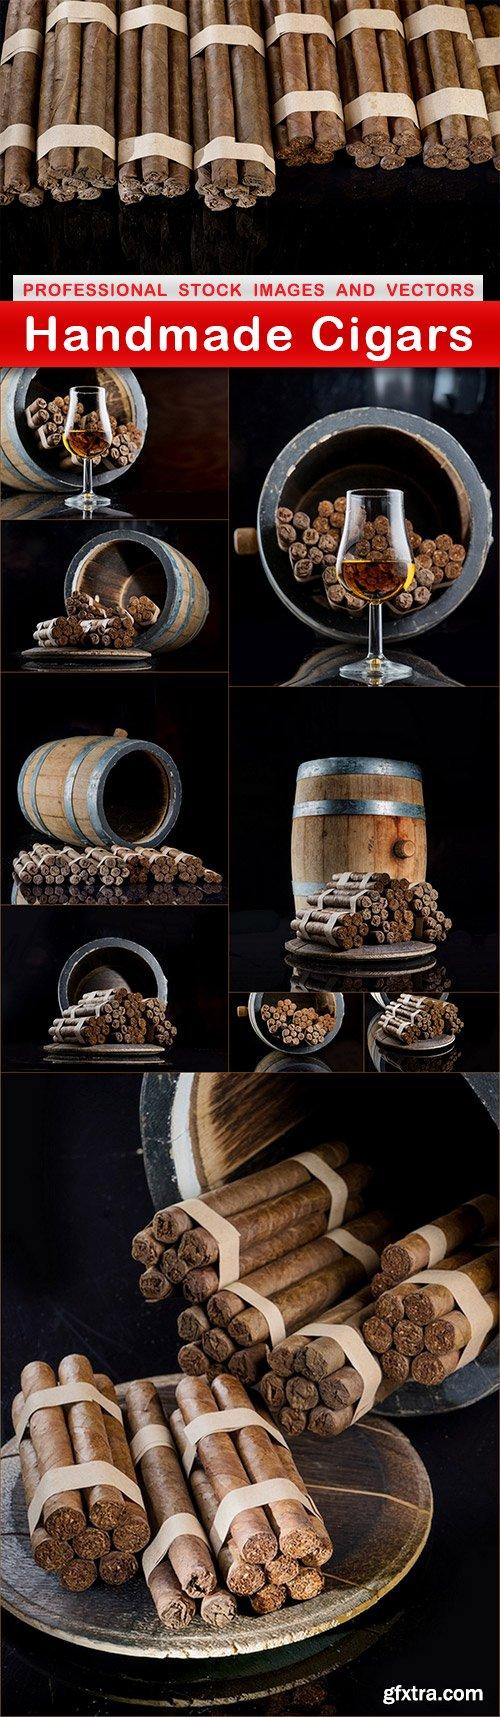 Handmade Cigars - 10 UHQ JPEG